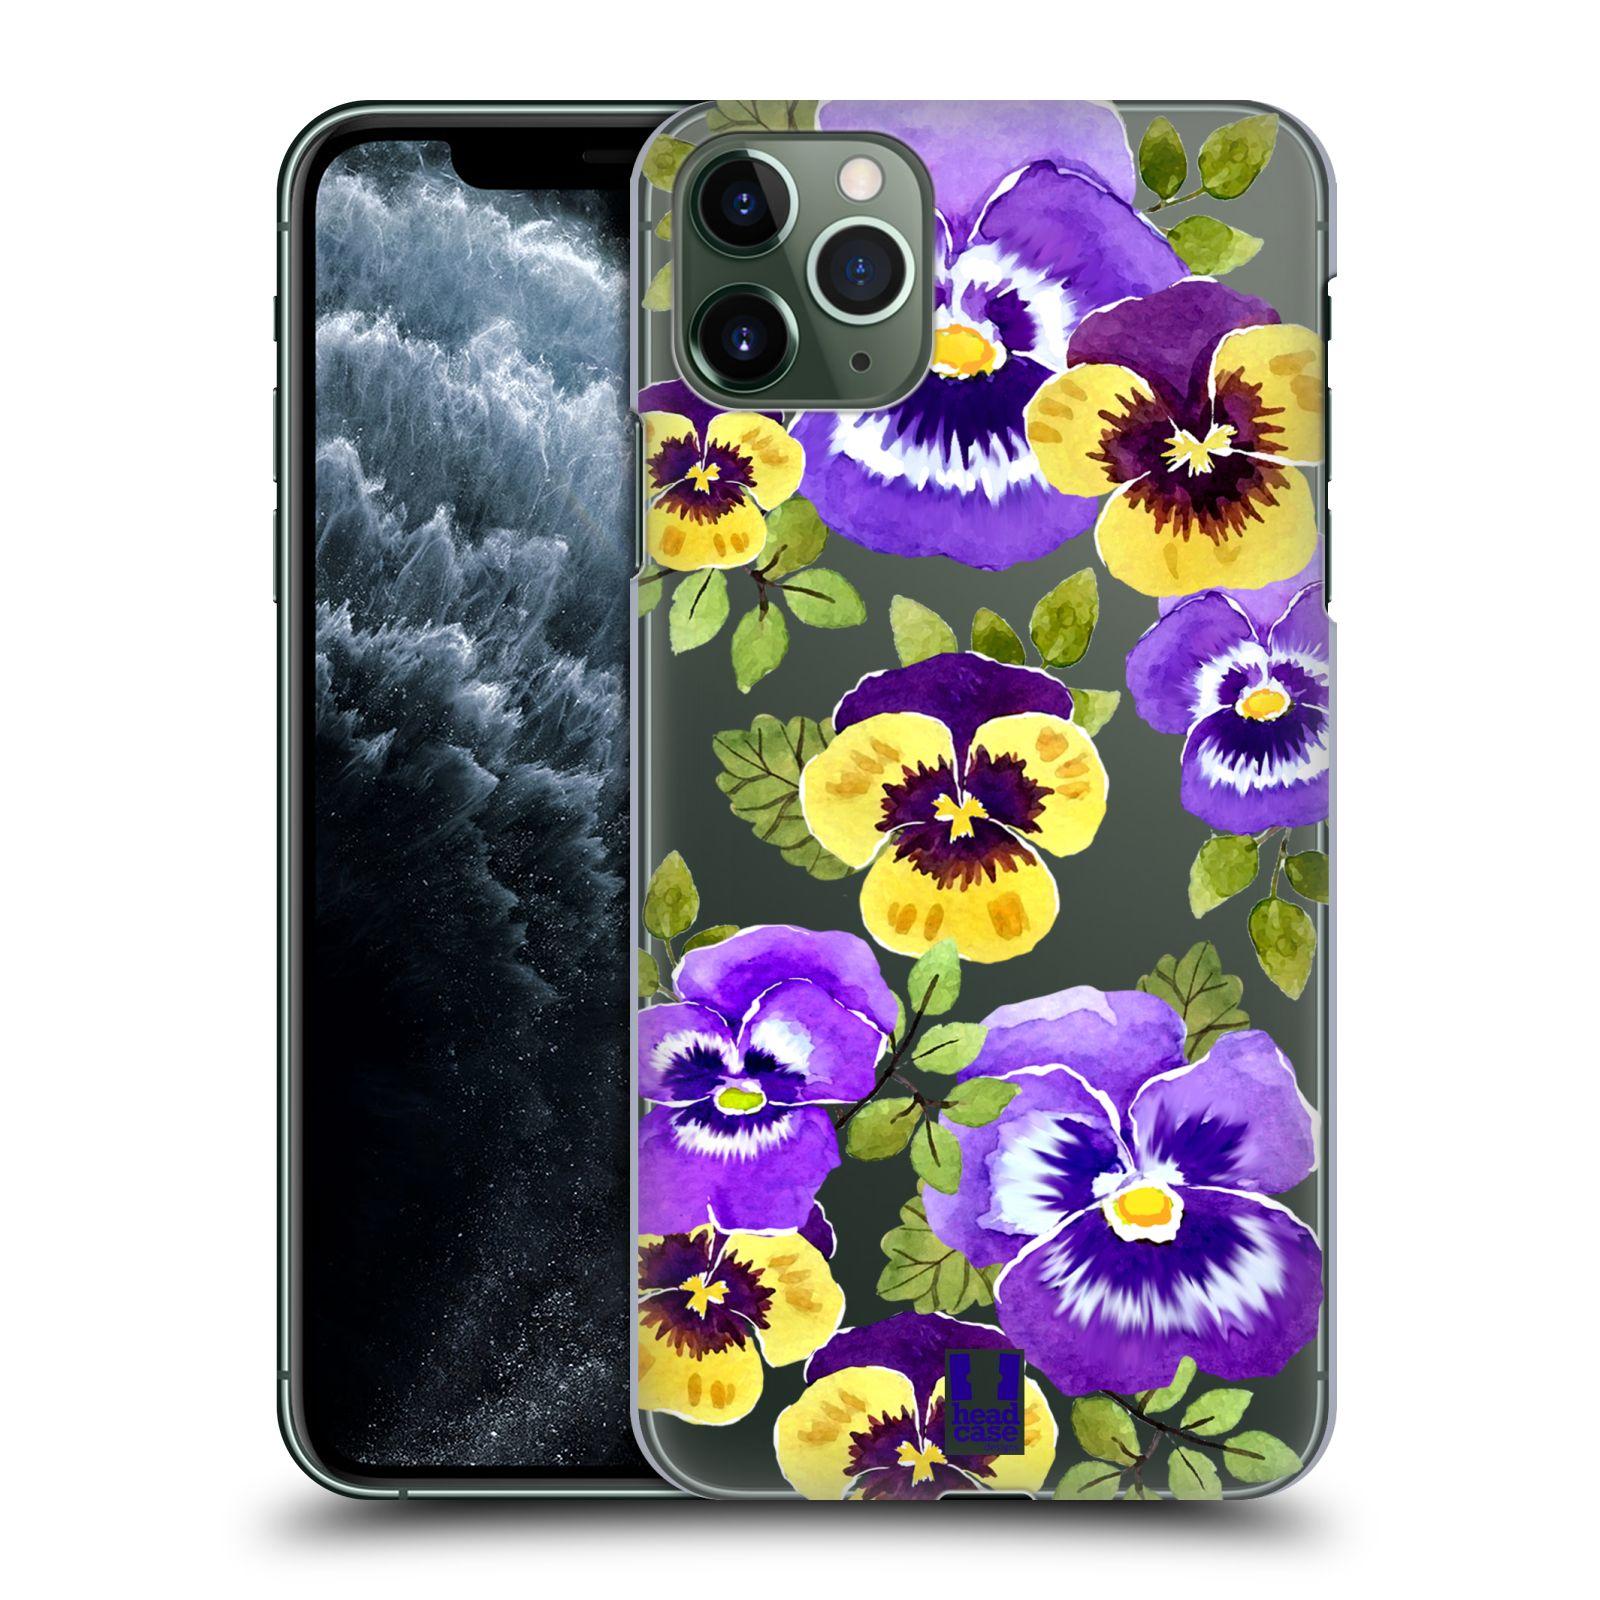 Pouzdro na mobil Apple Iphone 11 PRO MAX - HEAD CASE - Maceška fialová barva